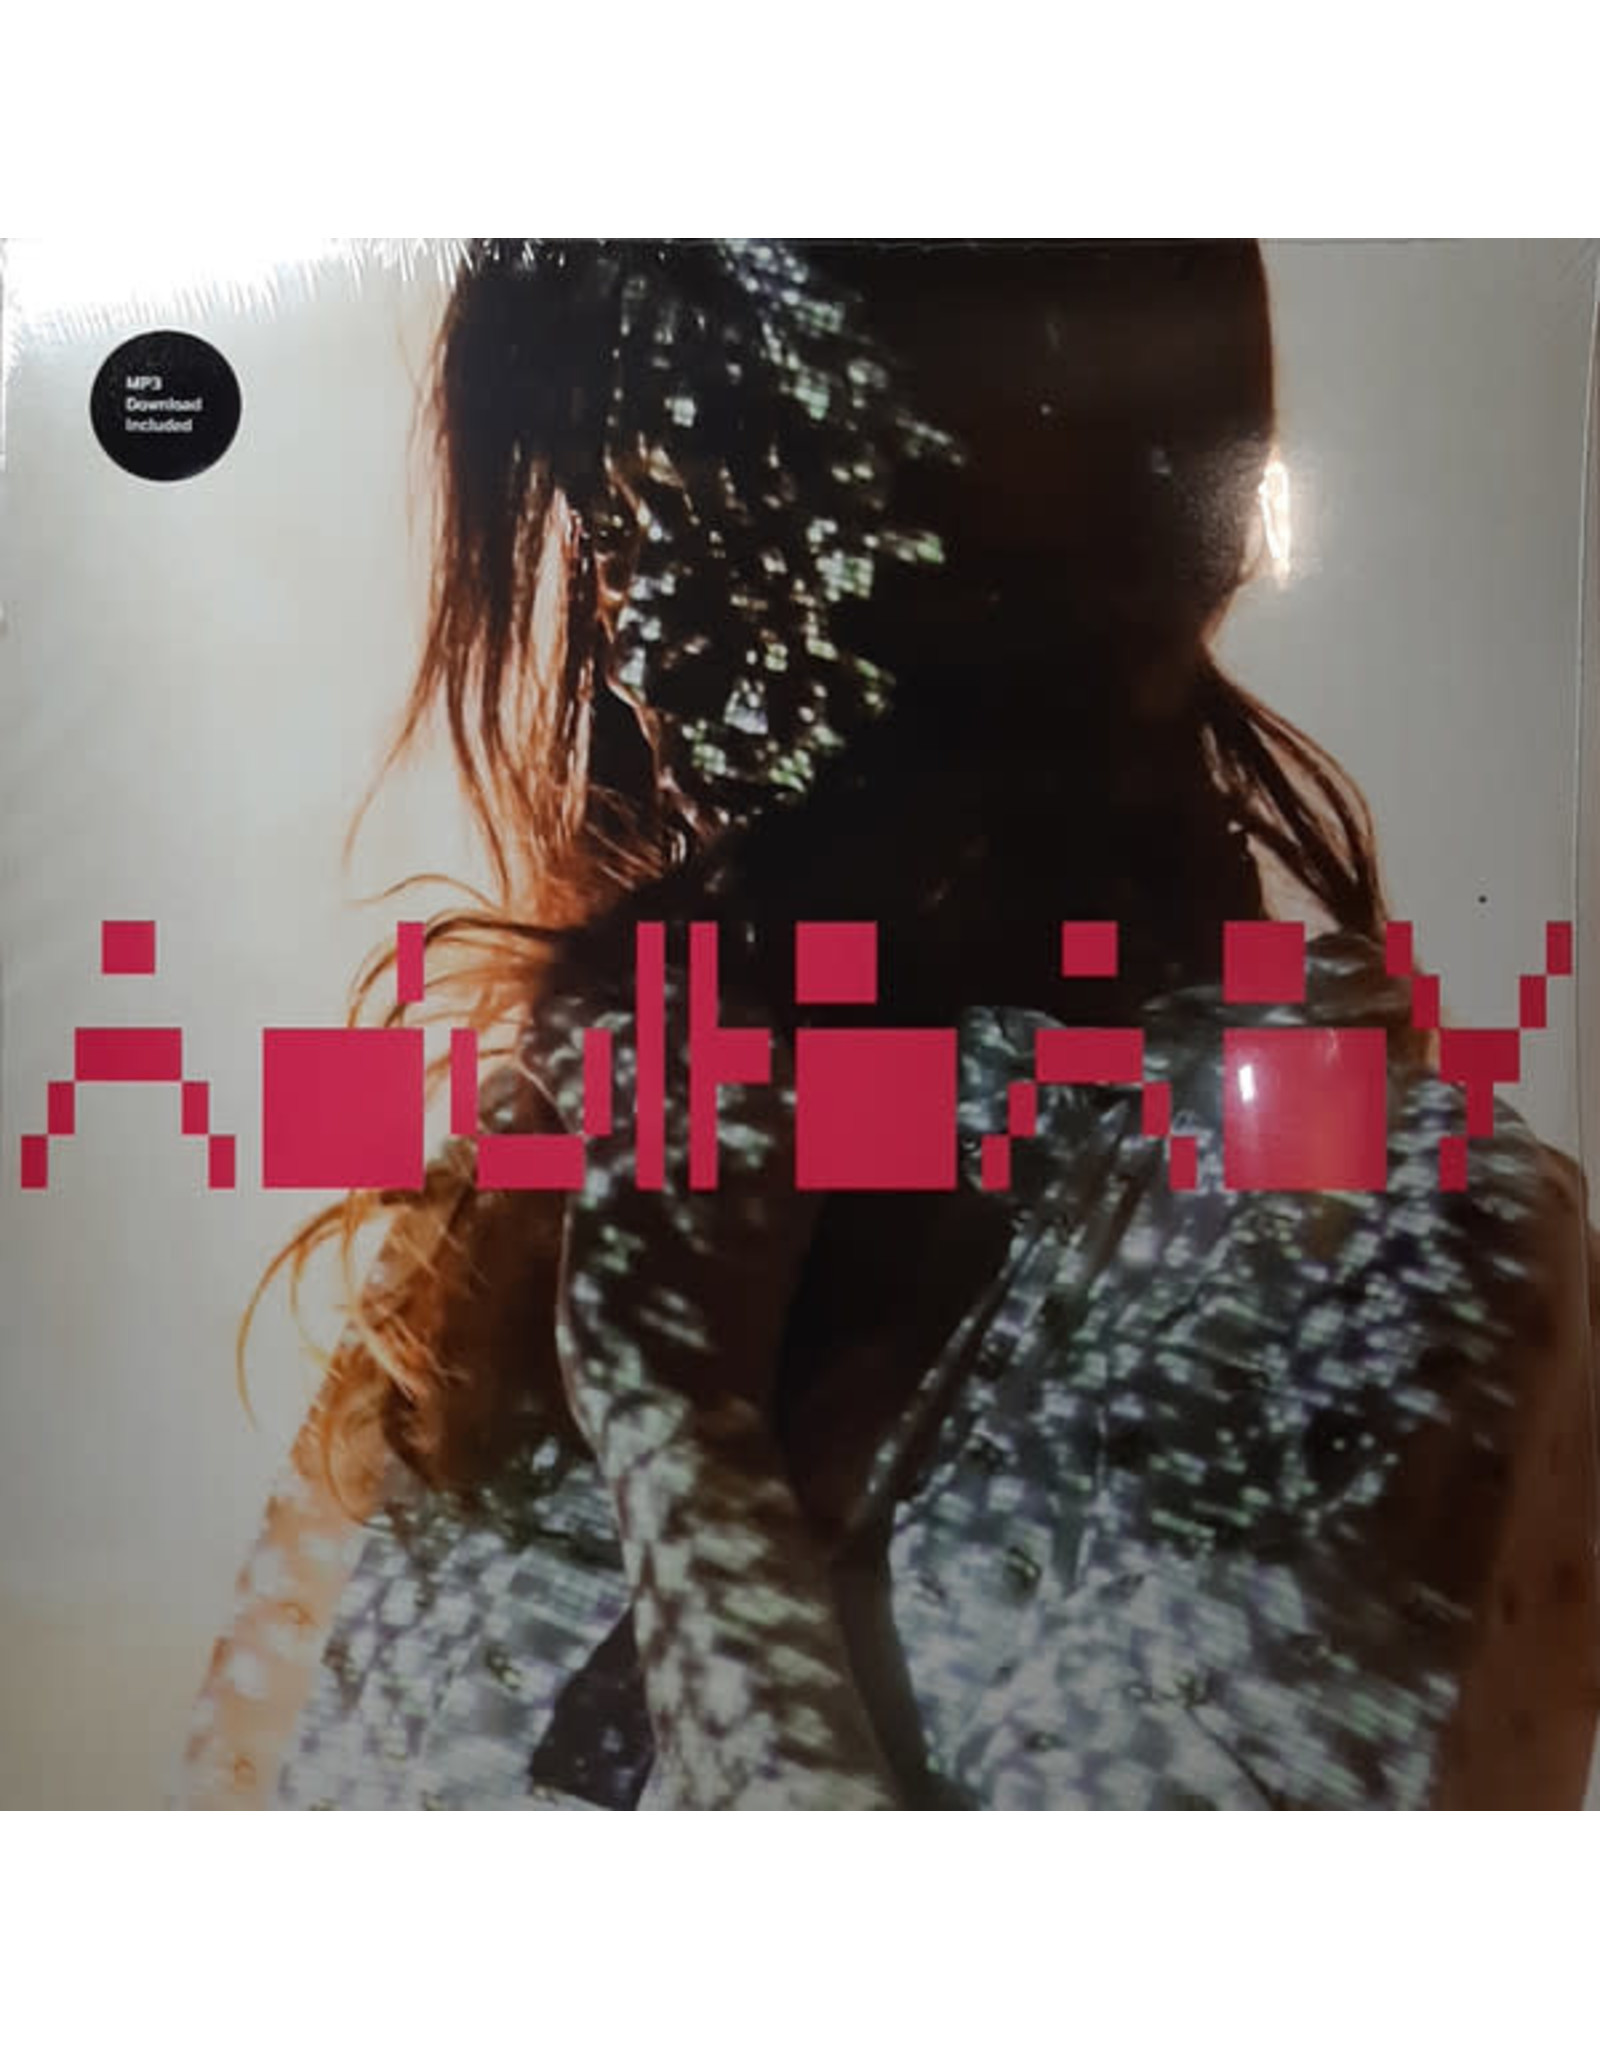 New Vinyl KAZU - Adult Baby LP